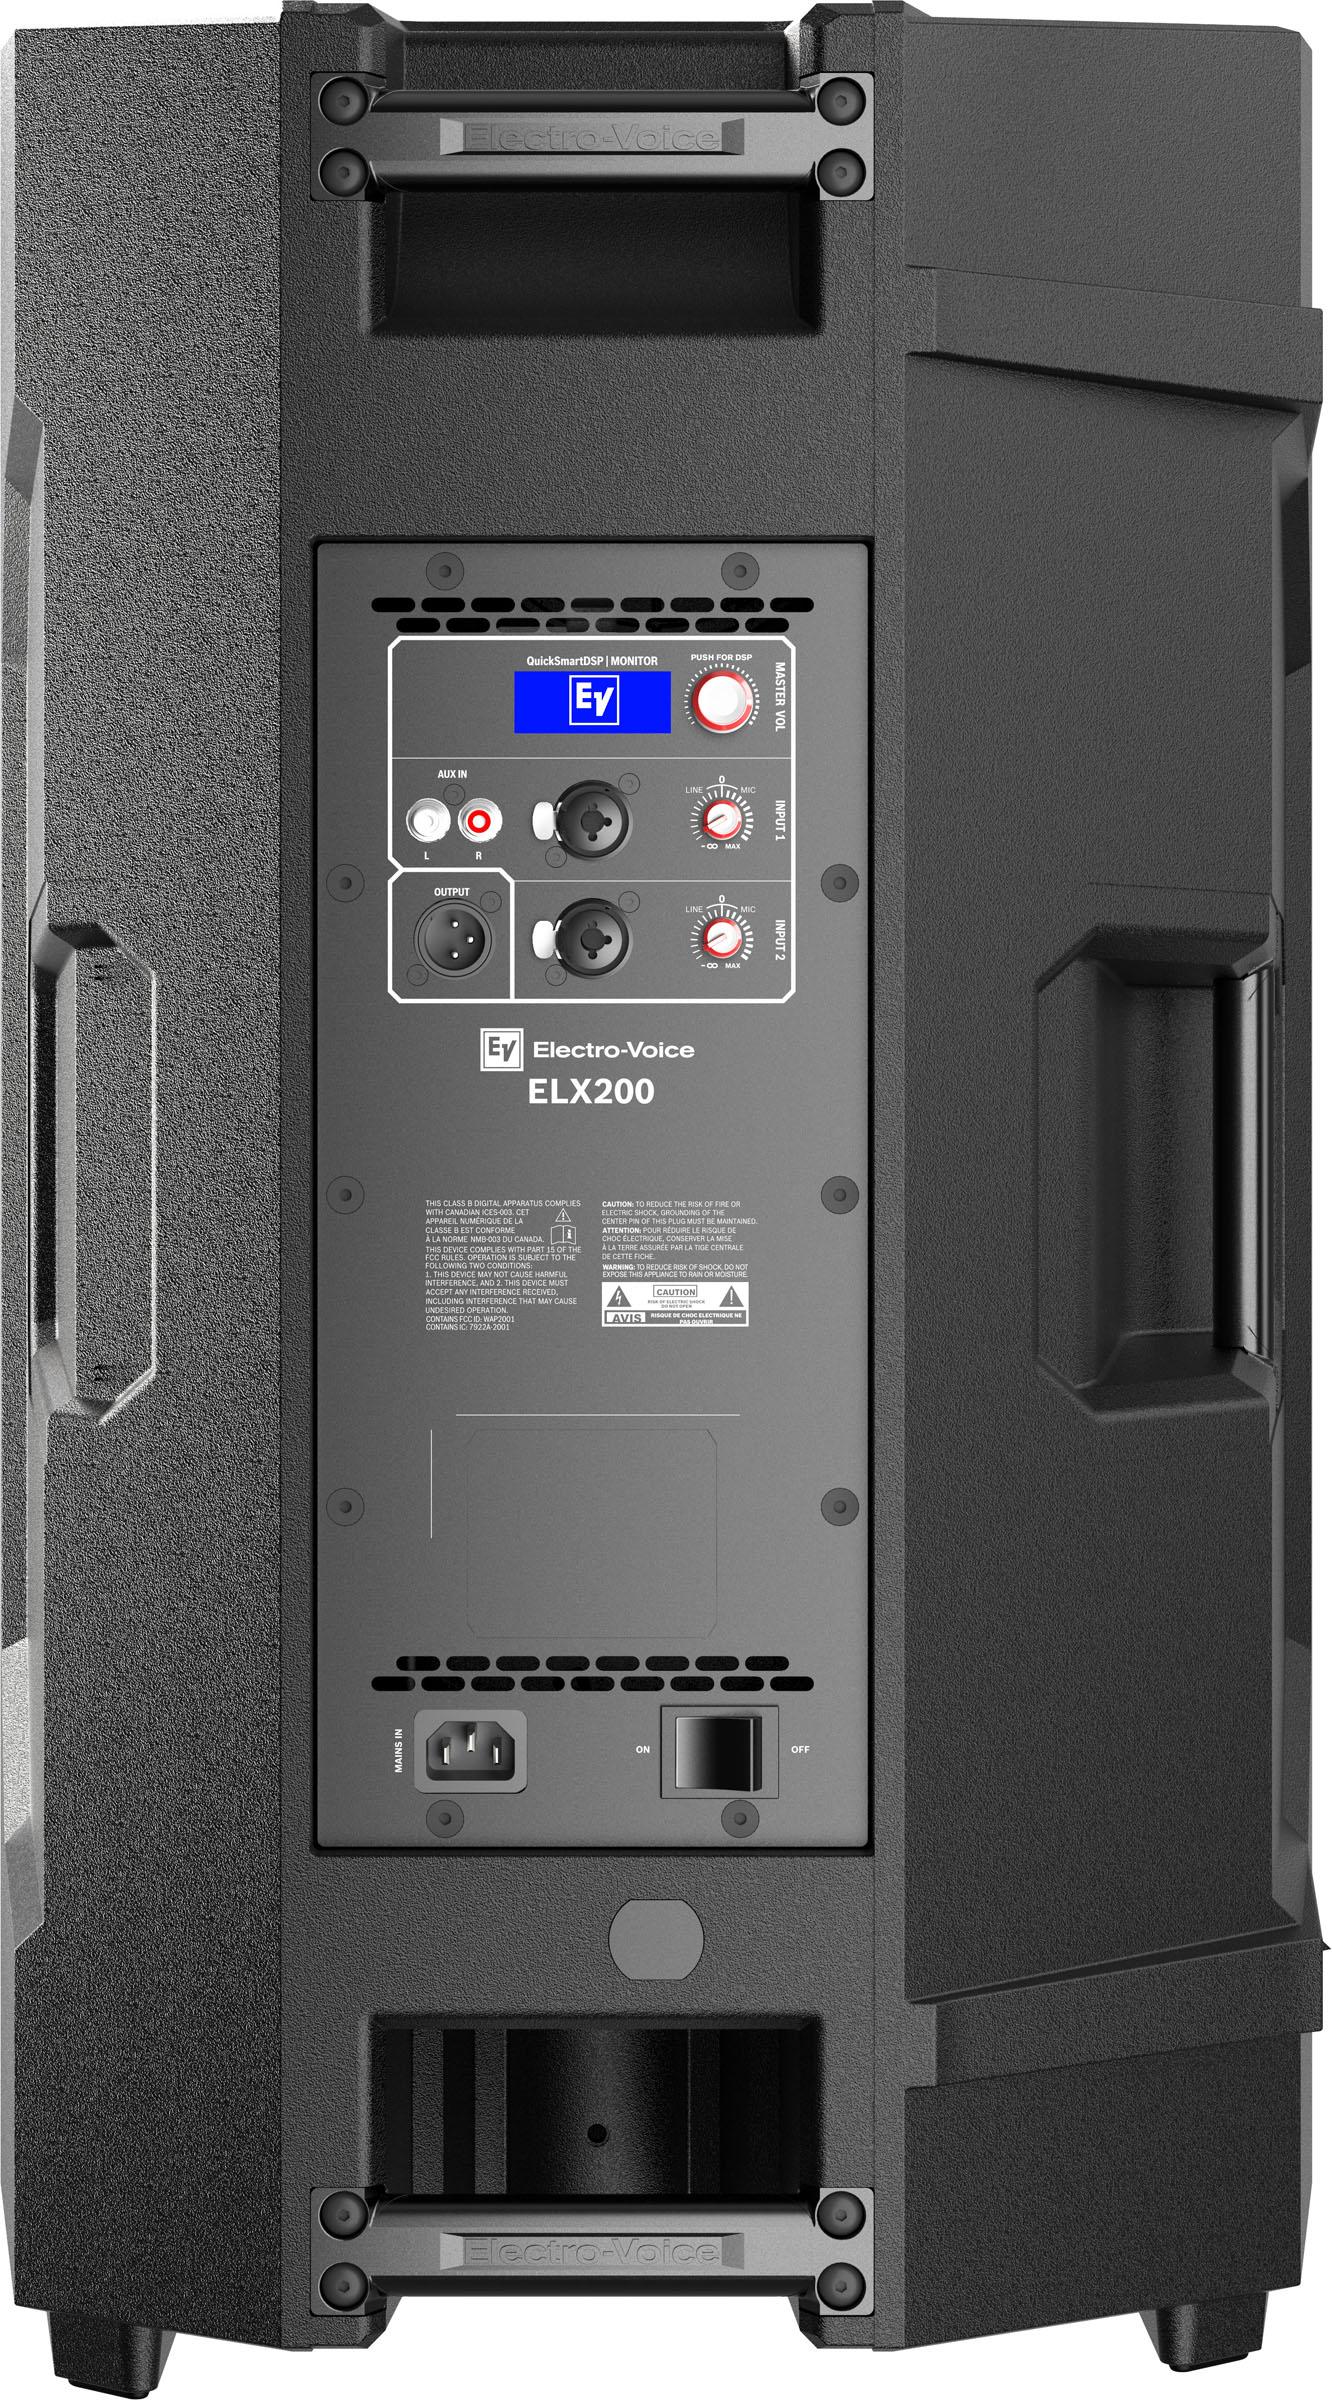 Electro-Voice ELX200 - نمای پشت باند های اکتیو و پسیو حرفه ای